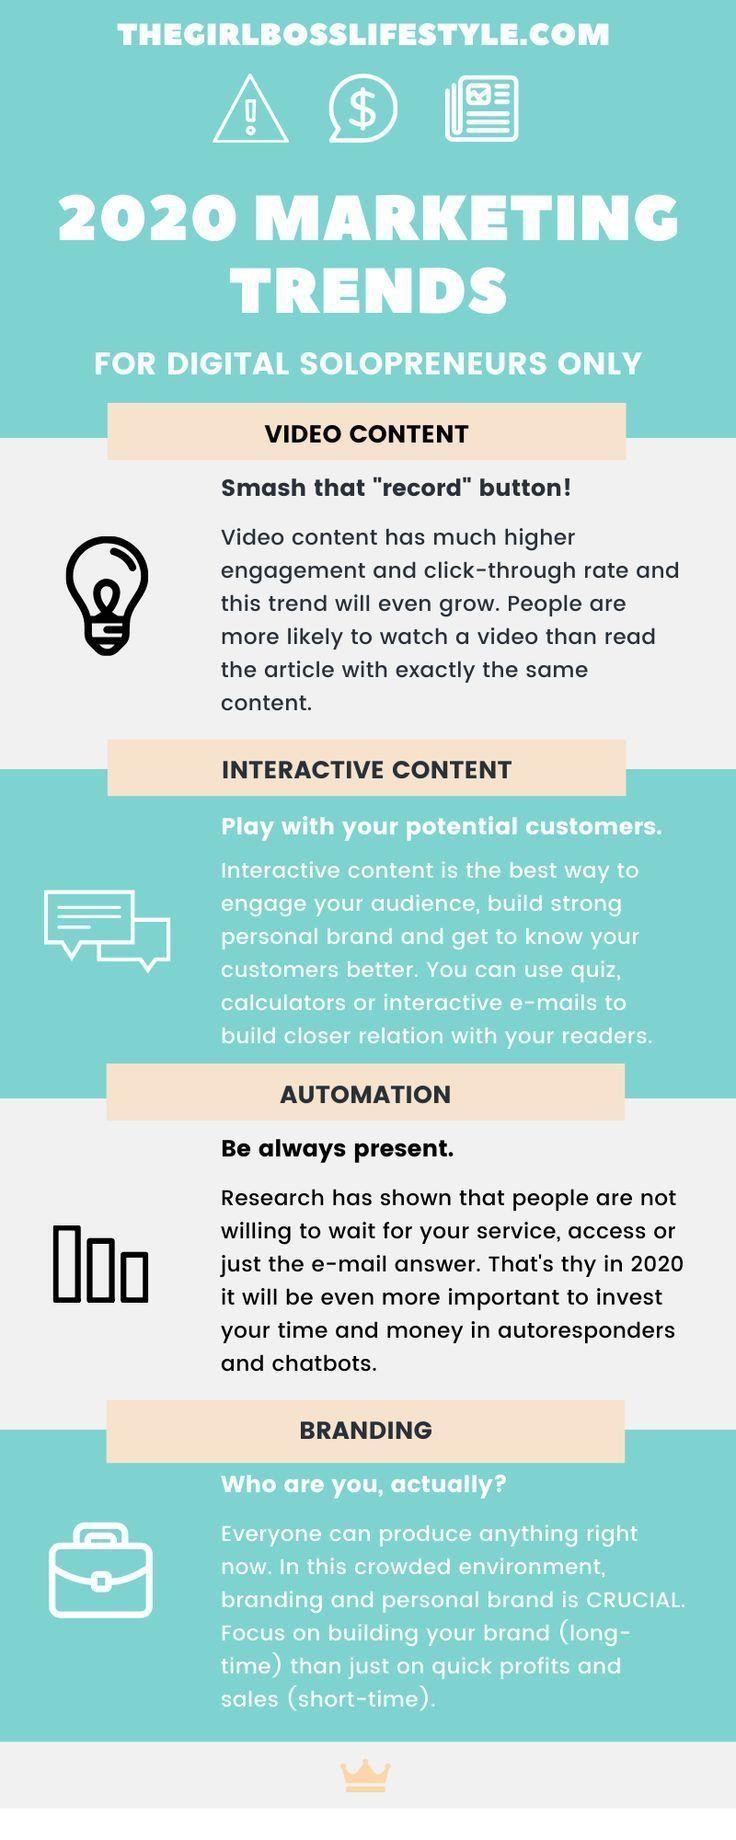 002 Fascinating Digital Marketing Plan Template 2019 Image Full